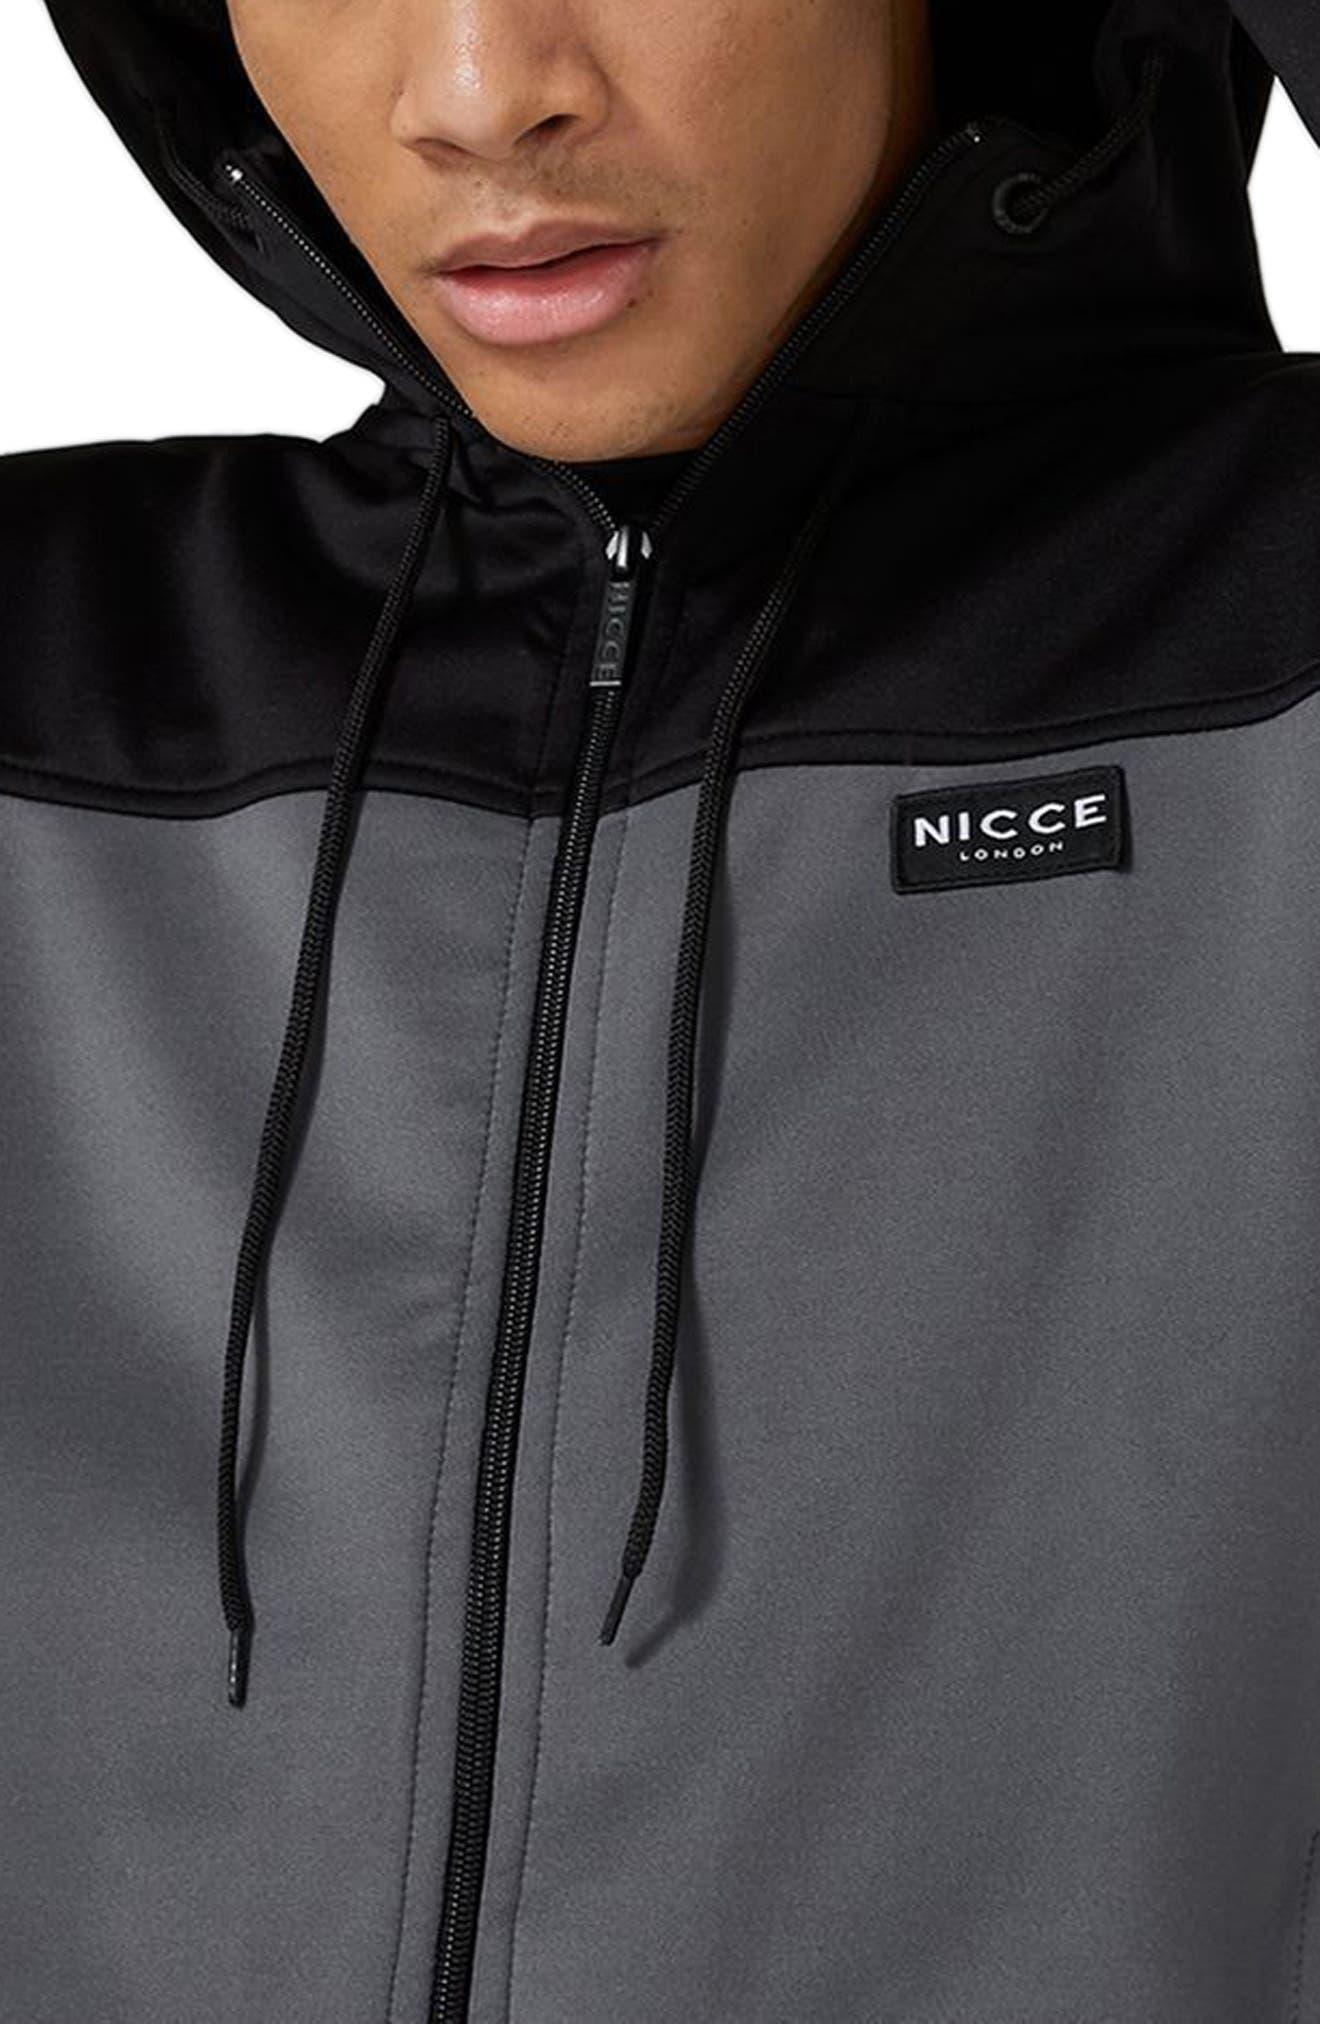 Alternate Image 3  - Topshop NICCE Hybrid Track Jacket